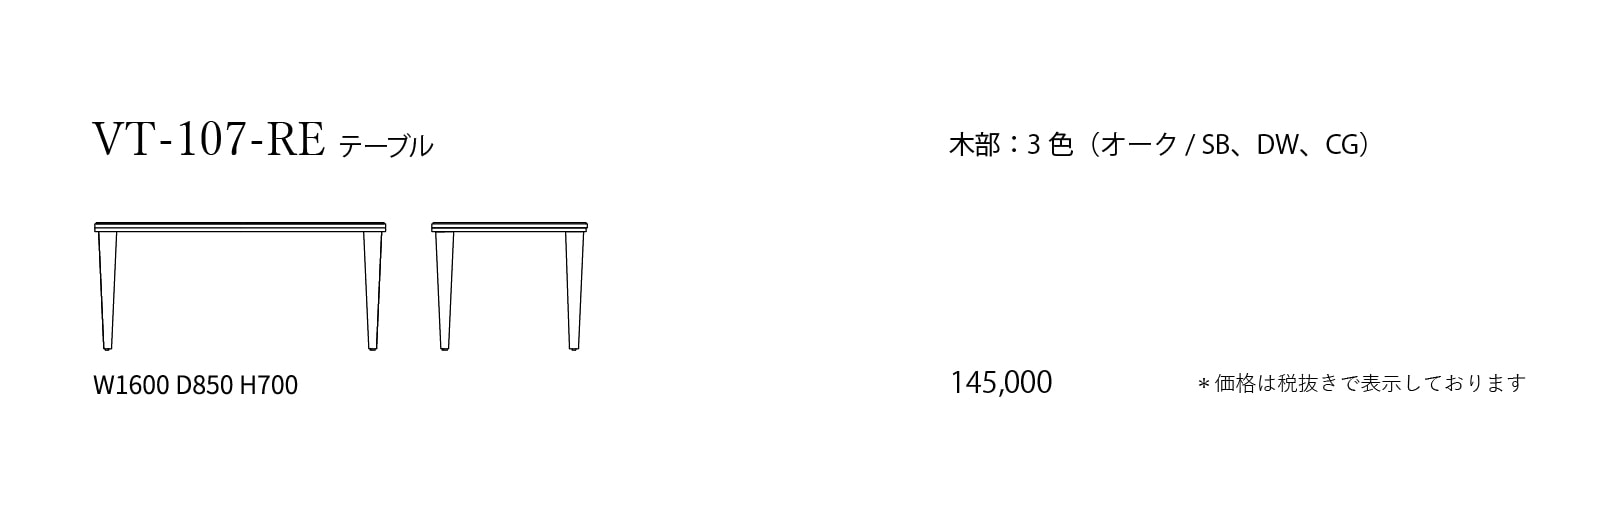 VT-107 Price List